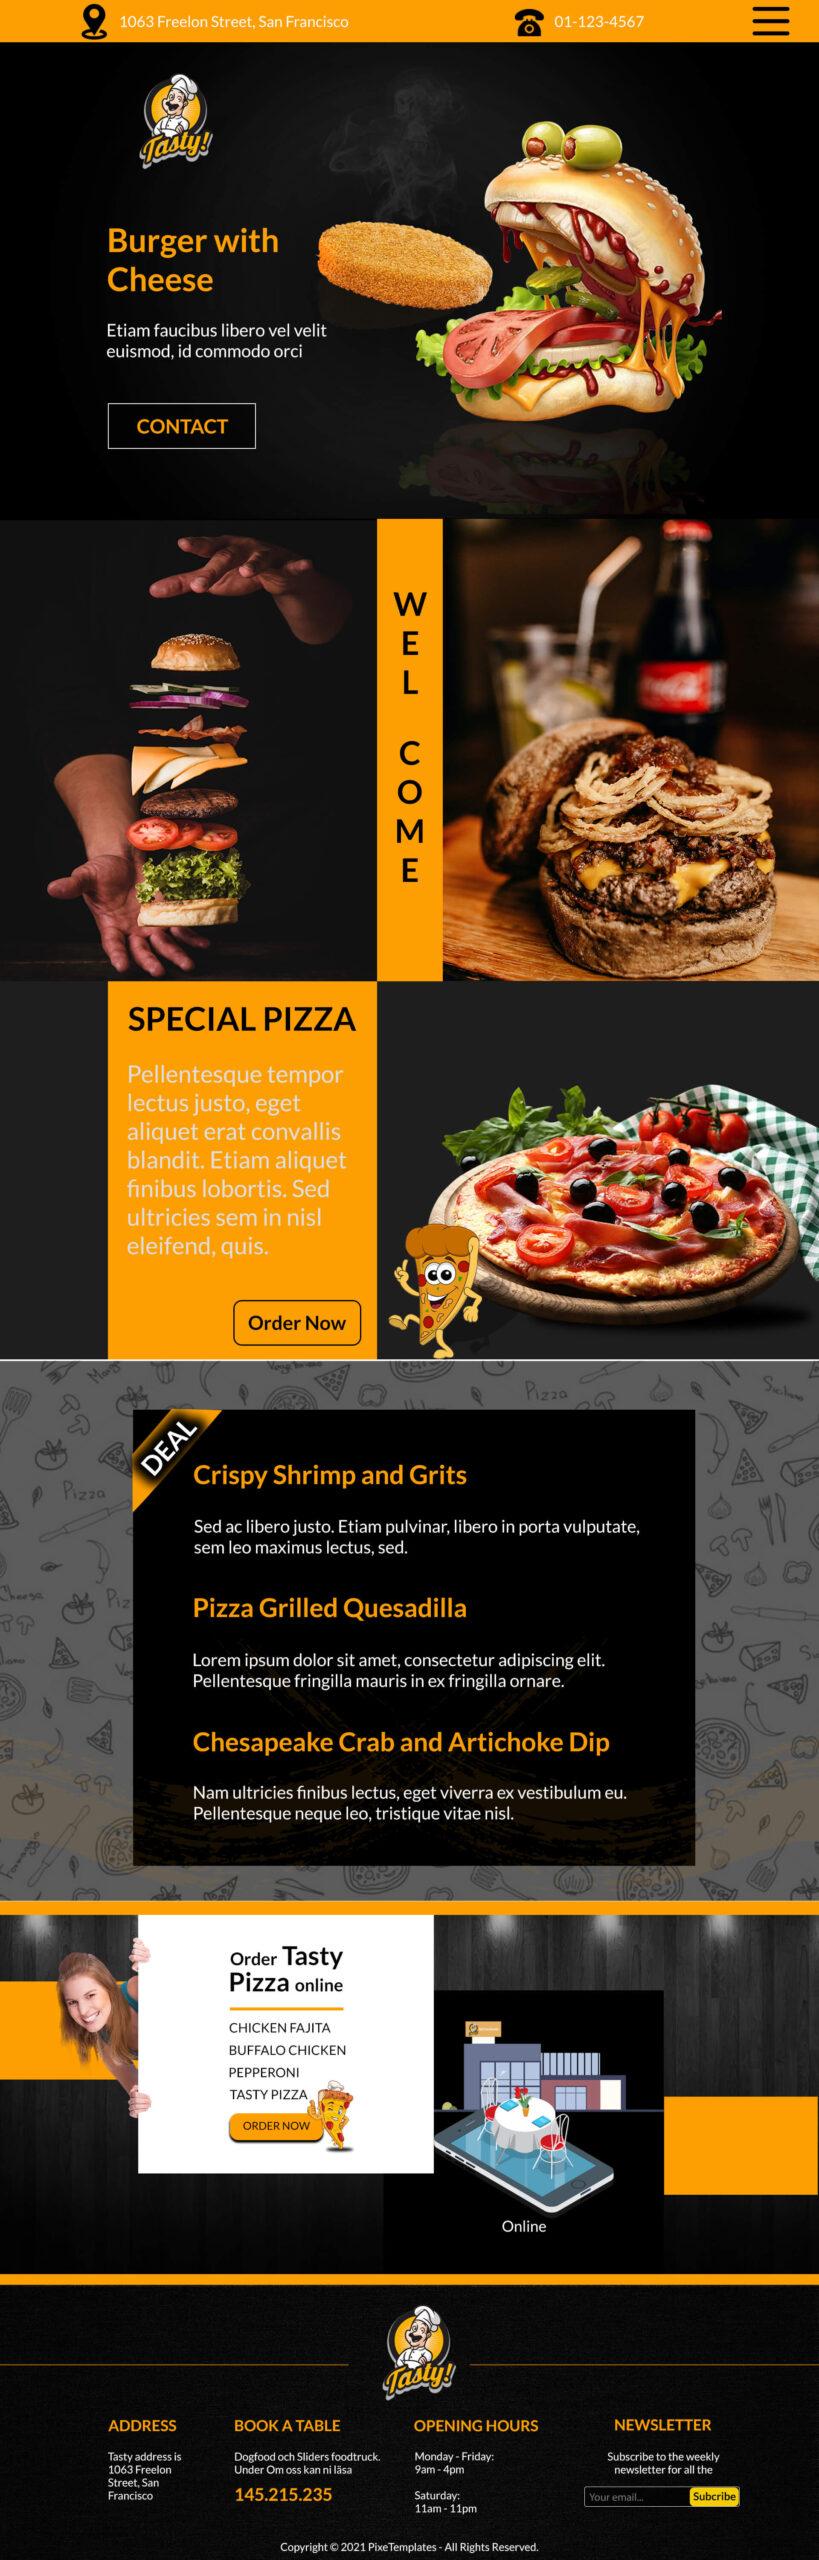 Tasty Burger Website Interface